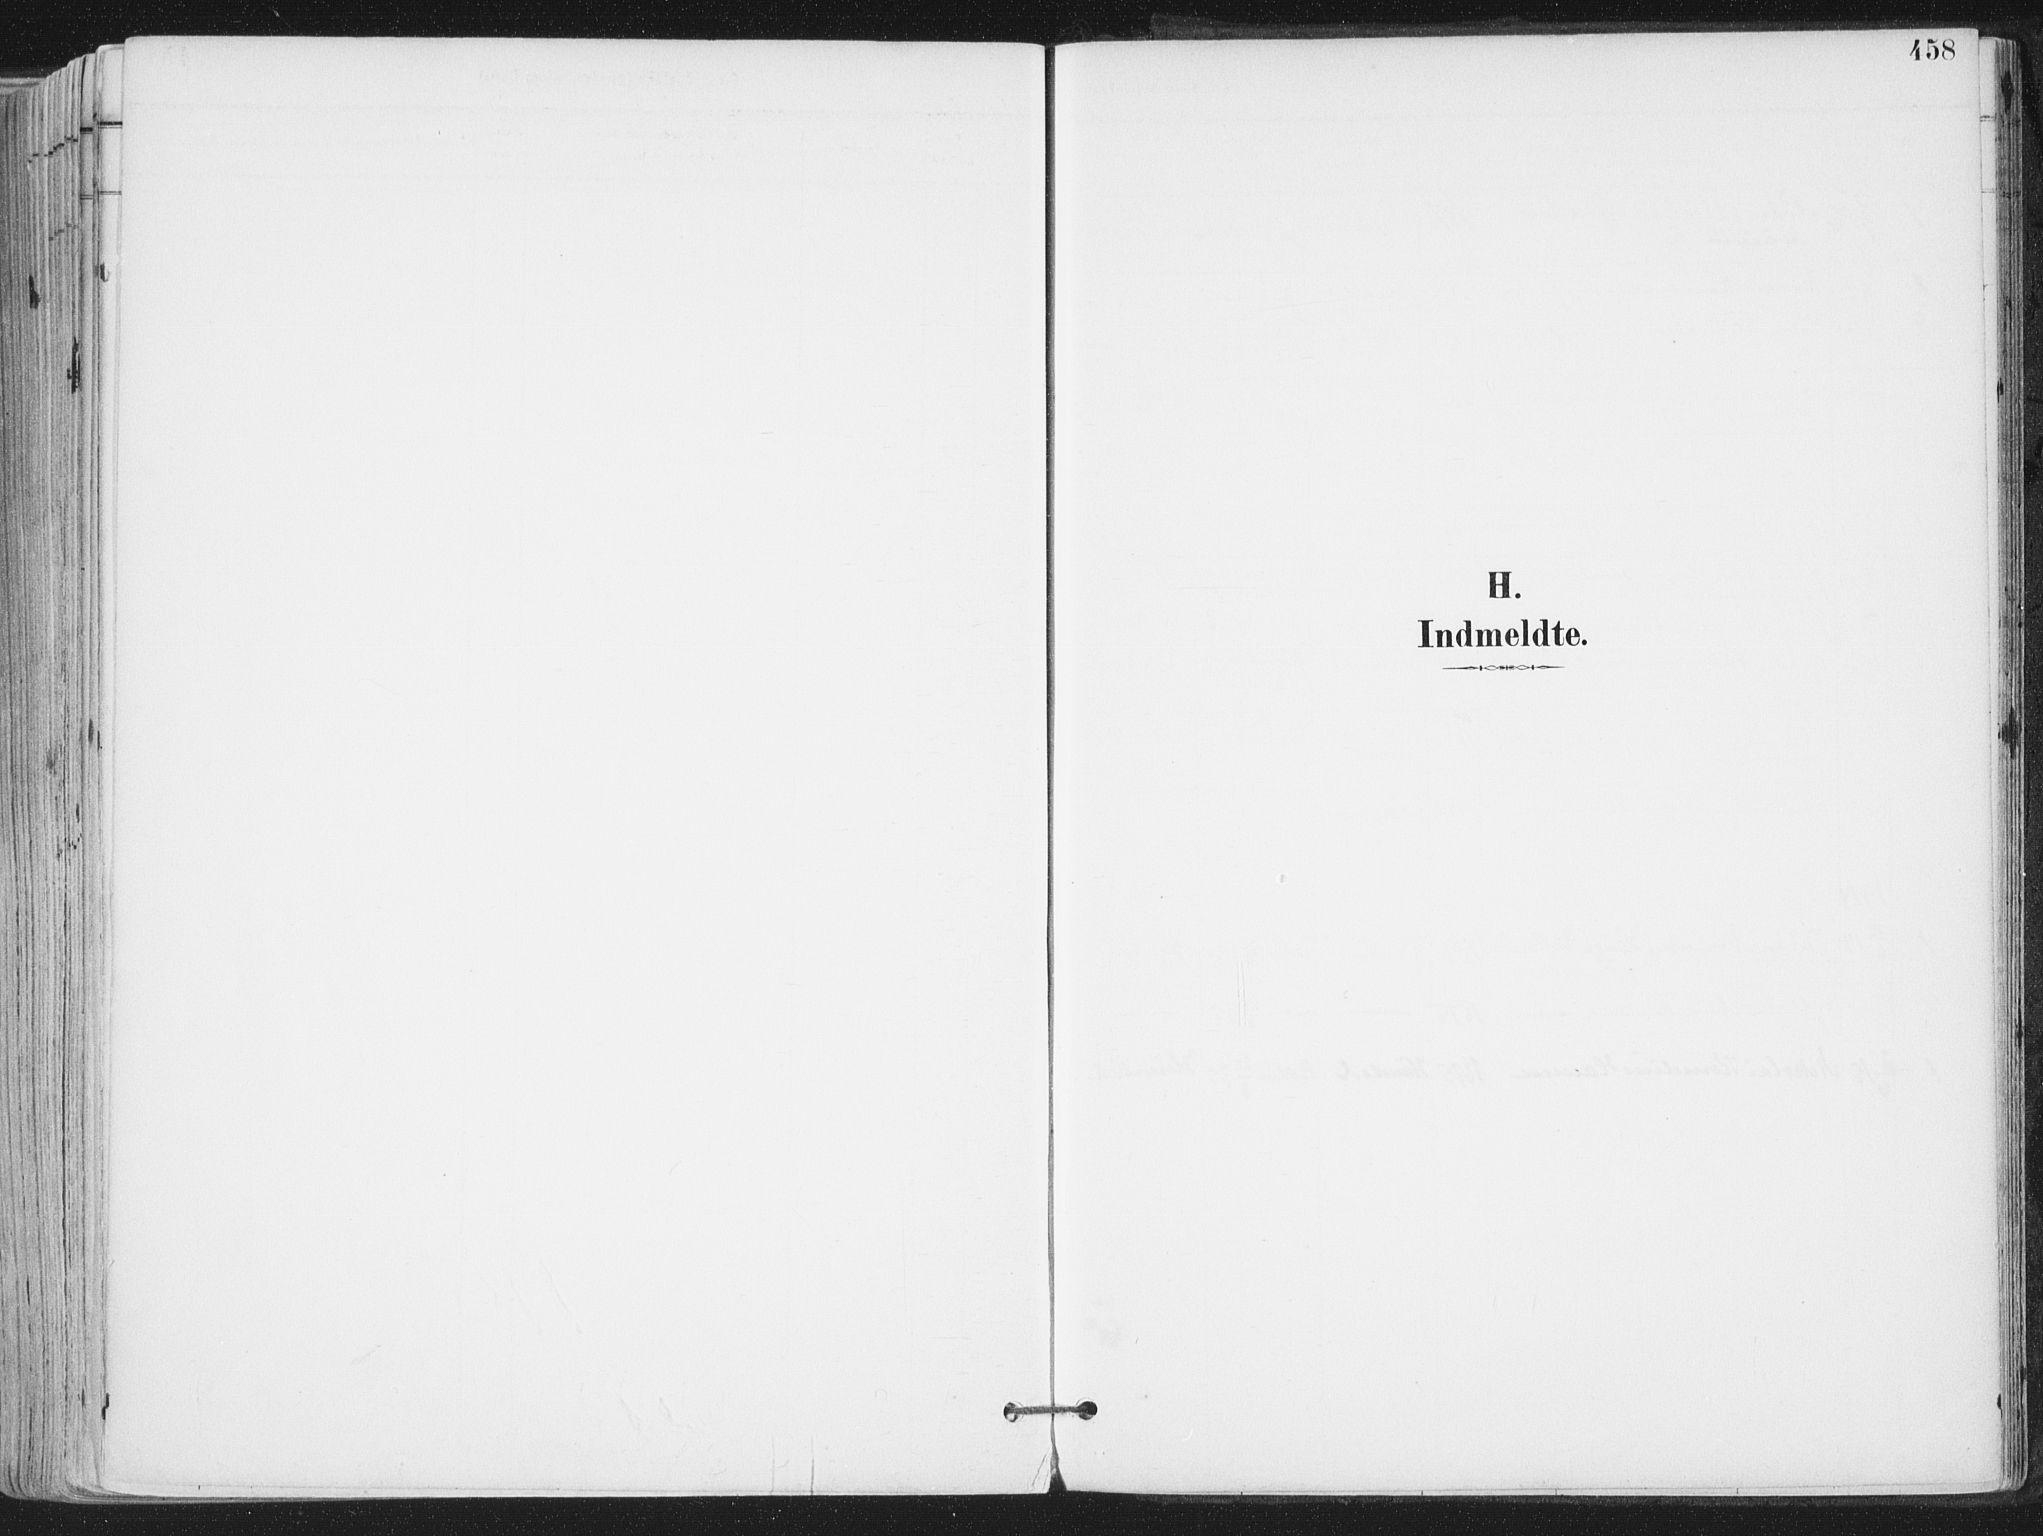 SAT, Ministerialprotokoller, klokkerbøker og fødselsregistre - Nordland, 802/L0055: Ministerialbok nr. 802A02, 1894-1915, s. 458